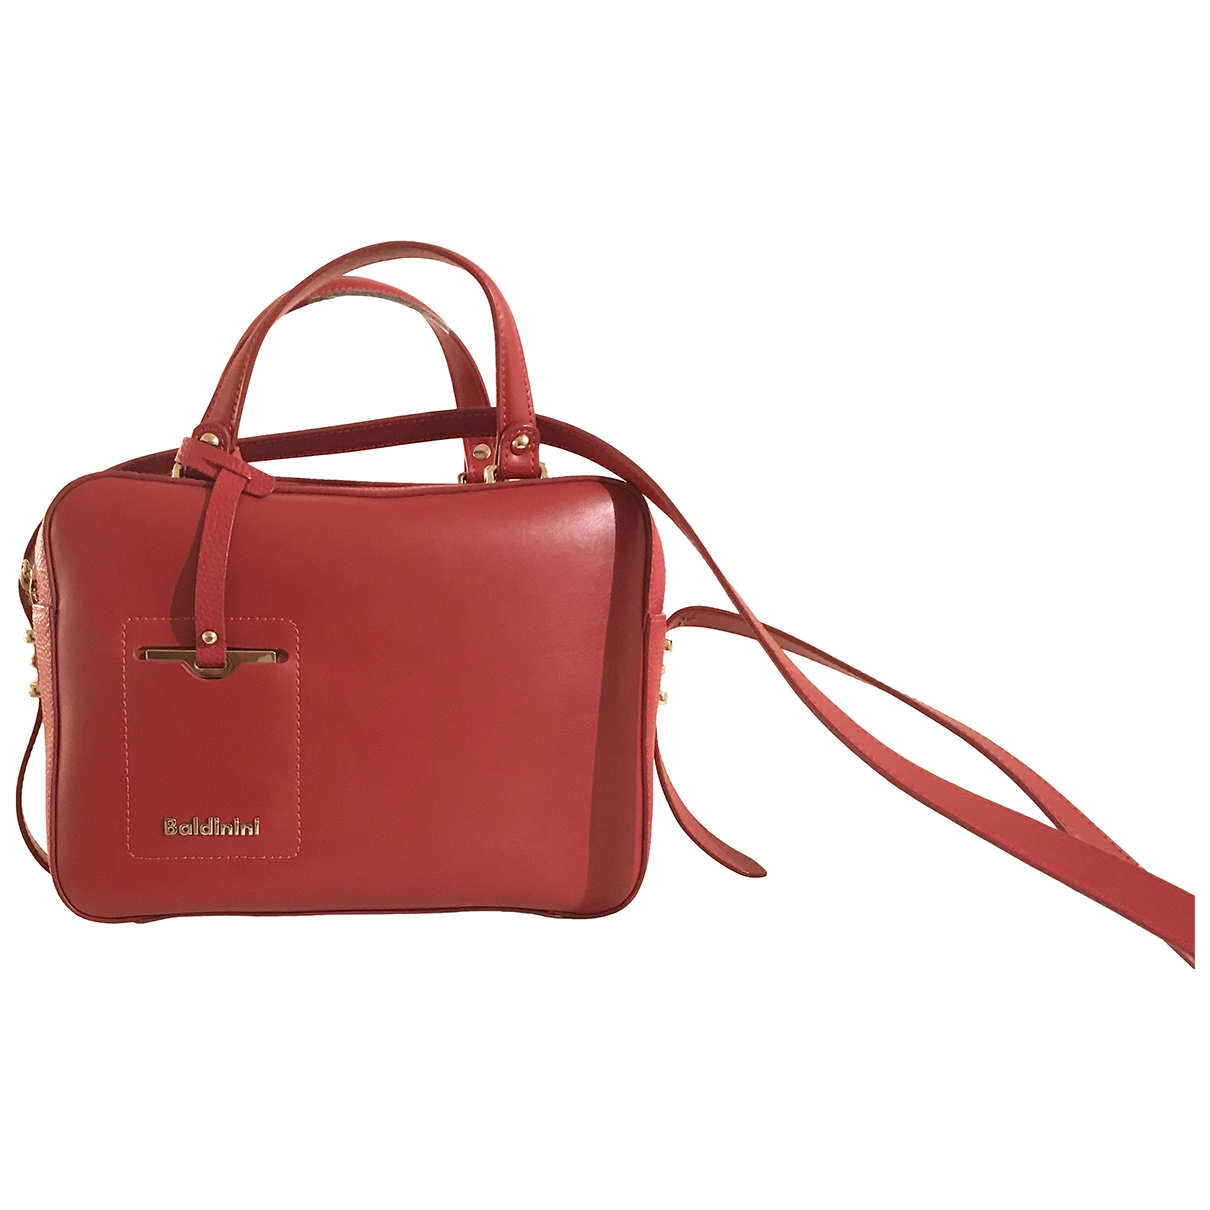 Baldinini \N Burgundy Leather handbag for Women \N